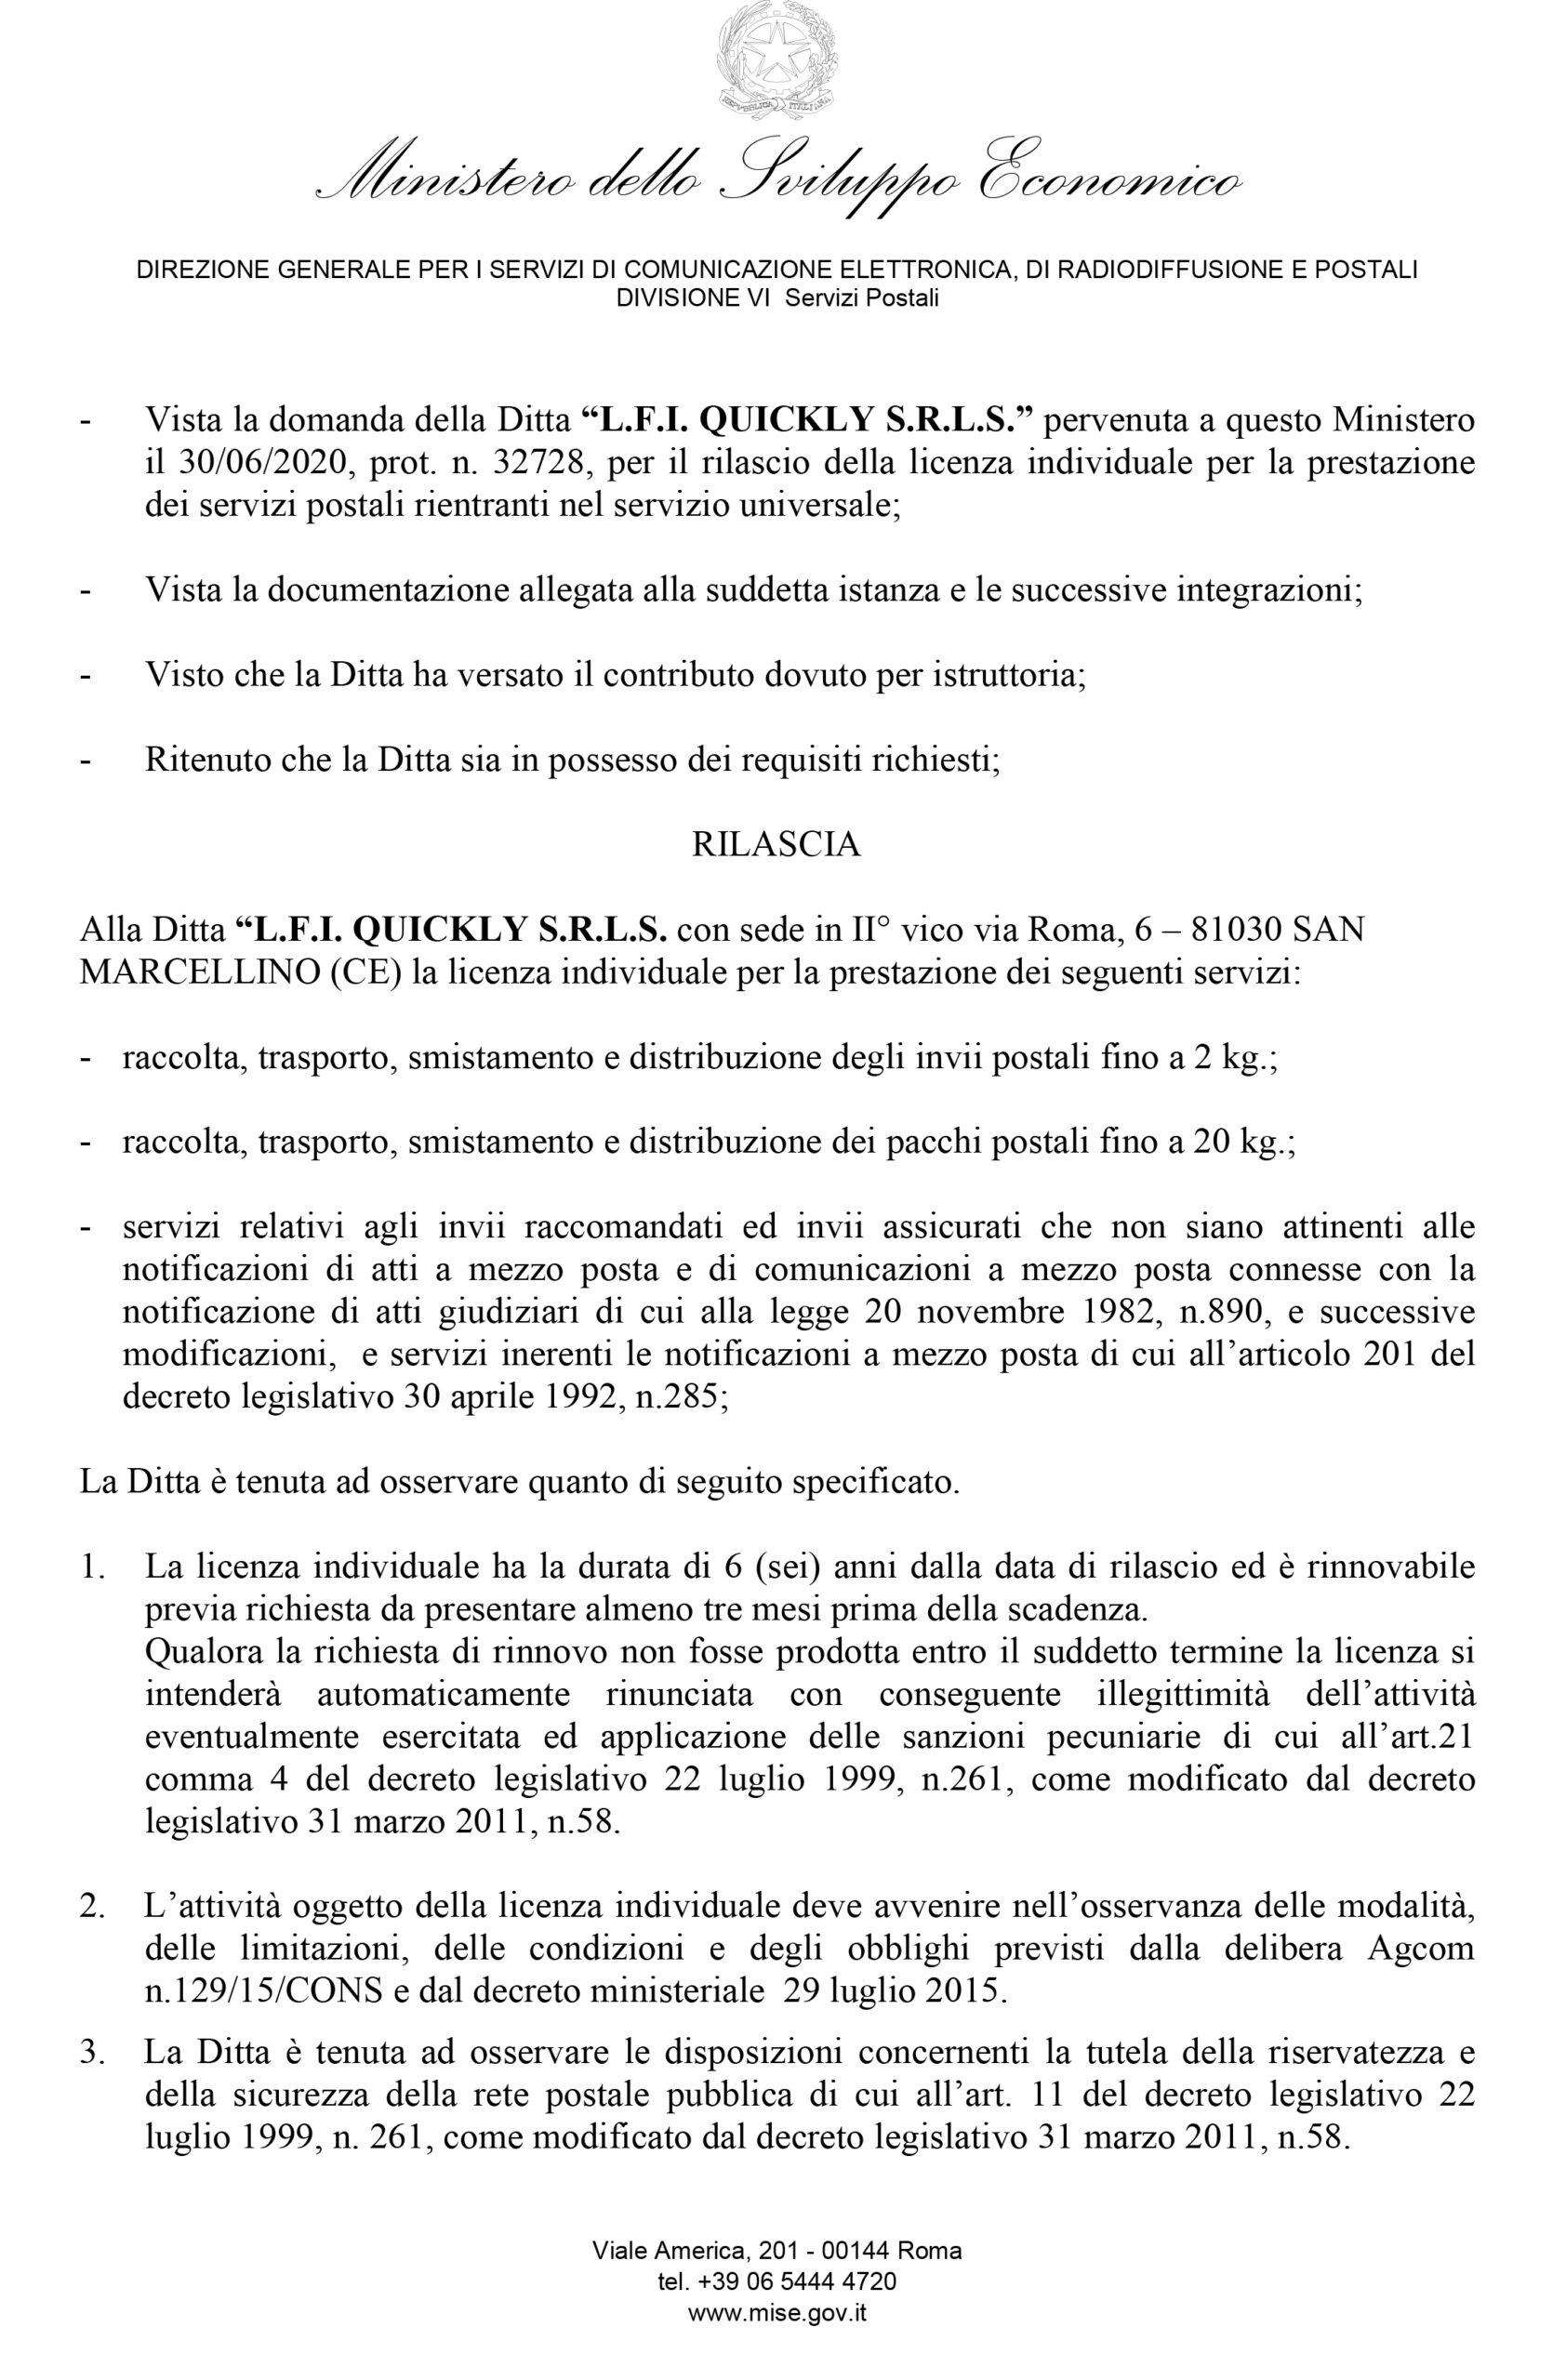 DGRSP/II/LIC/774/09/ZF